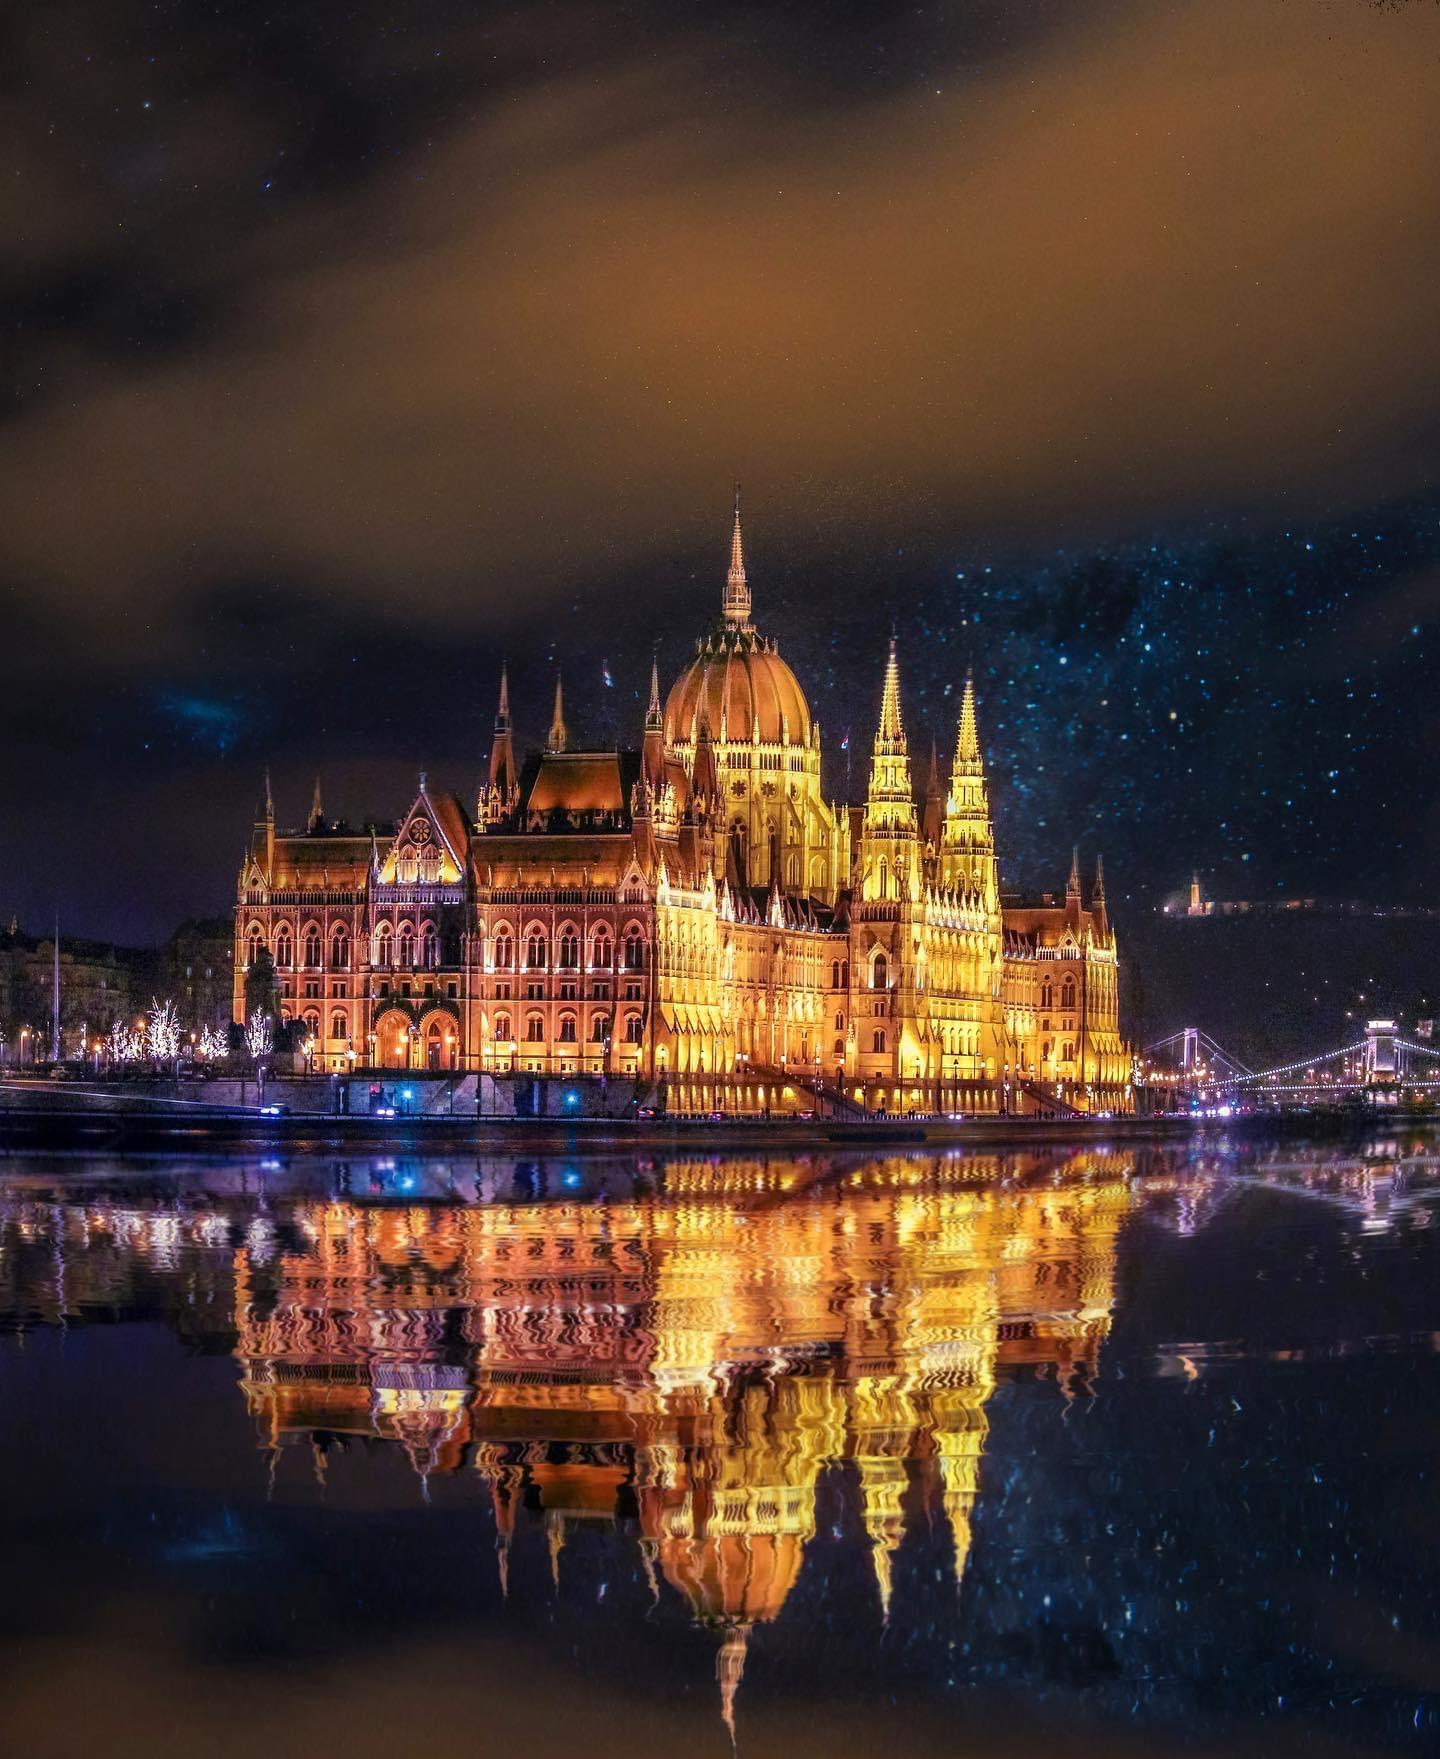 Будапешт, Венгрия. Фото Флориан Ольбрехтс